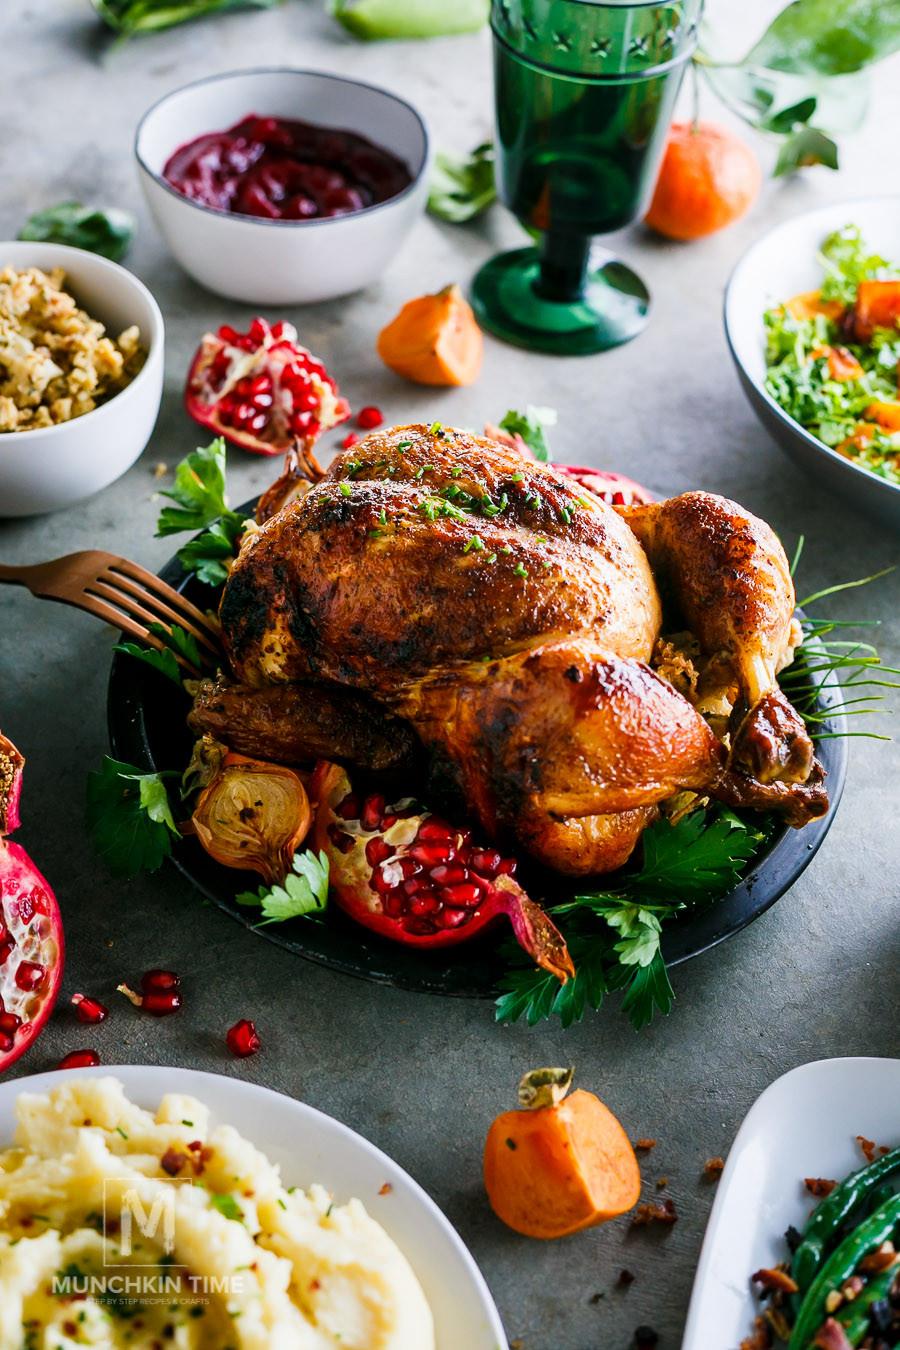 Thanksgiving Dinner Ideas  7 Thanksgiving Dinner Ideas 2017 Munchkin Time